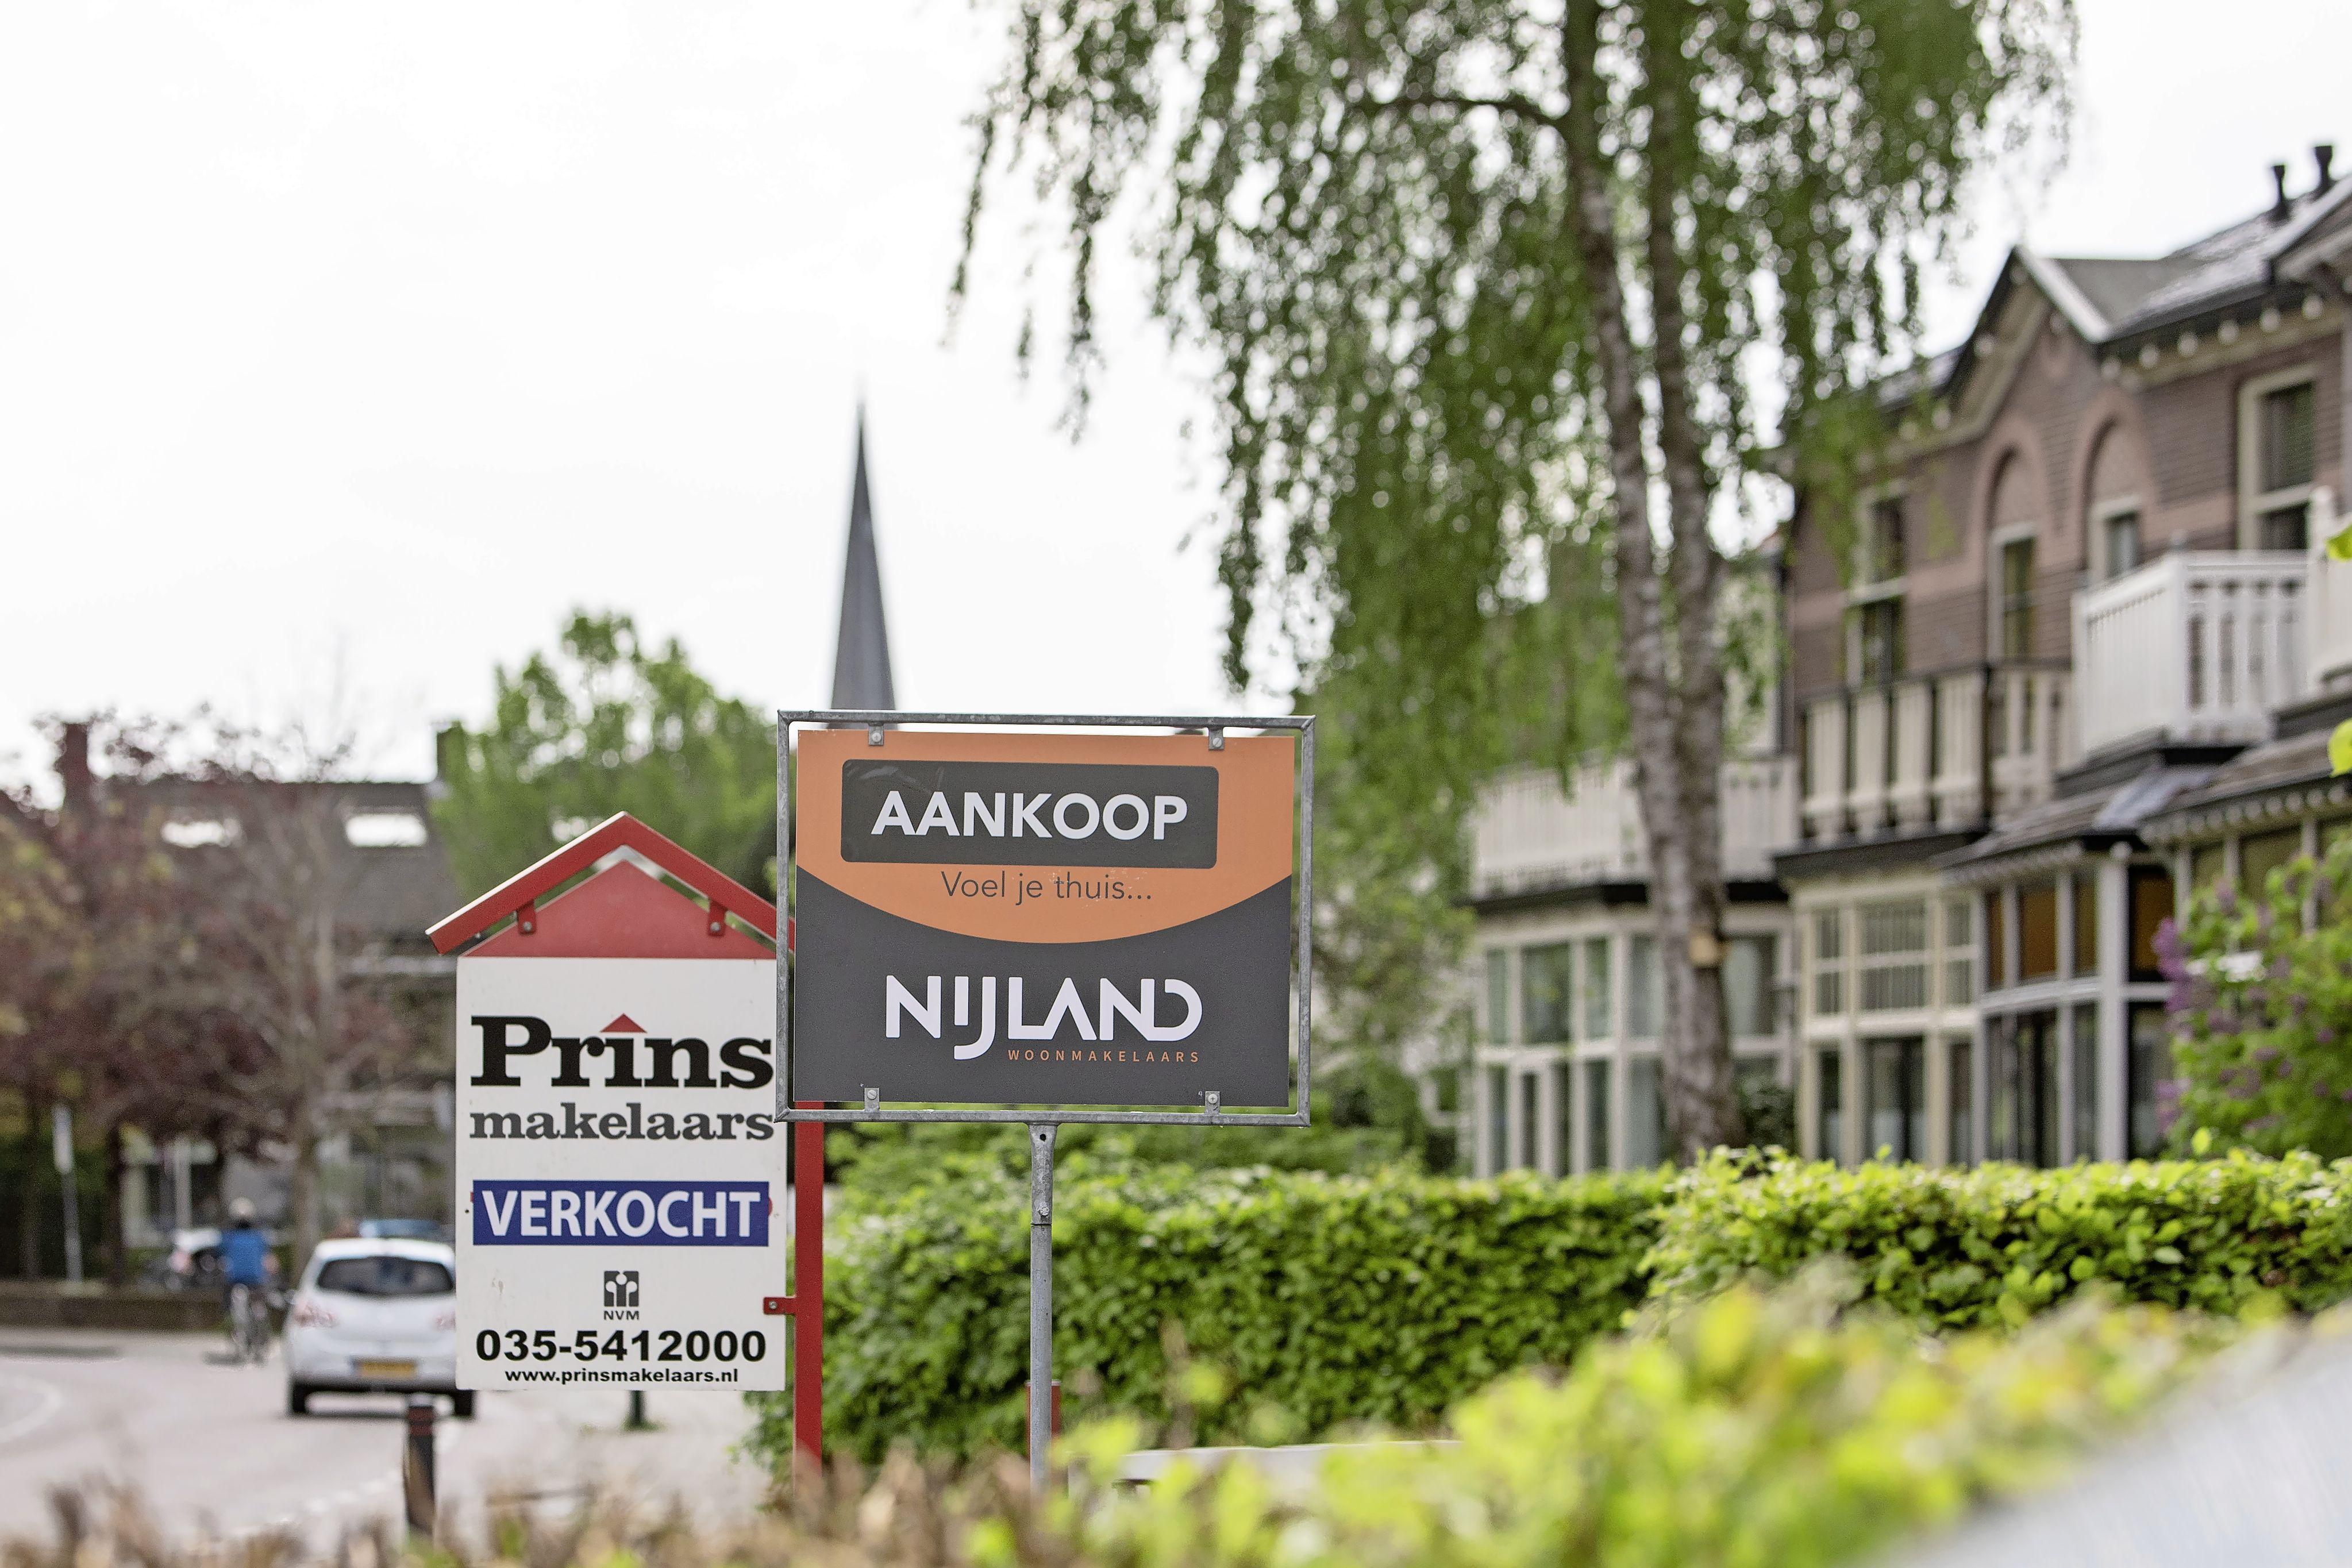 Te koop en verkocht: Baarns makelaarskantoor Prins gaat verder als onderdeel van regionale Nijland Makelaars